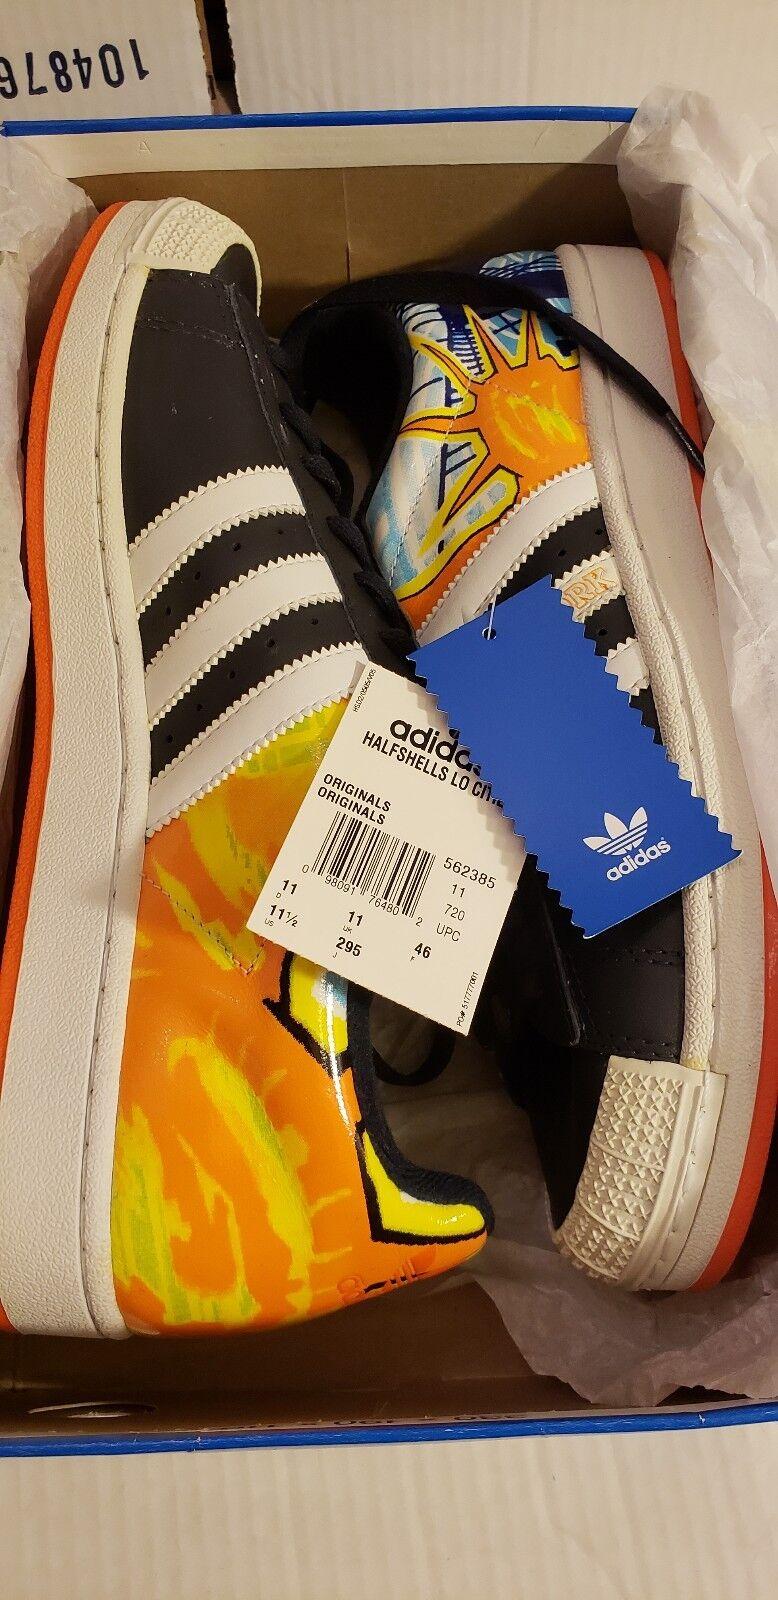 Für adidas halfshells halfshells halfshells lo citie nyc männer sportschuhe 562385 sz 11,5 28 gemeinden 01e9b2